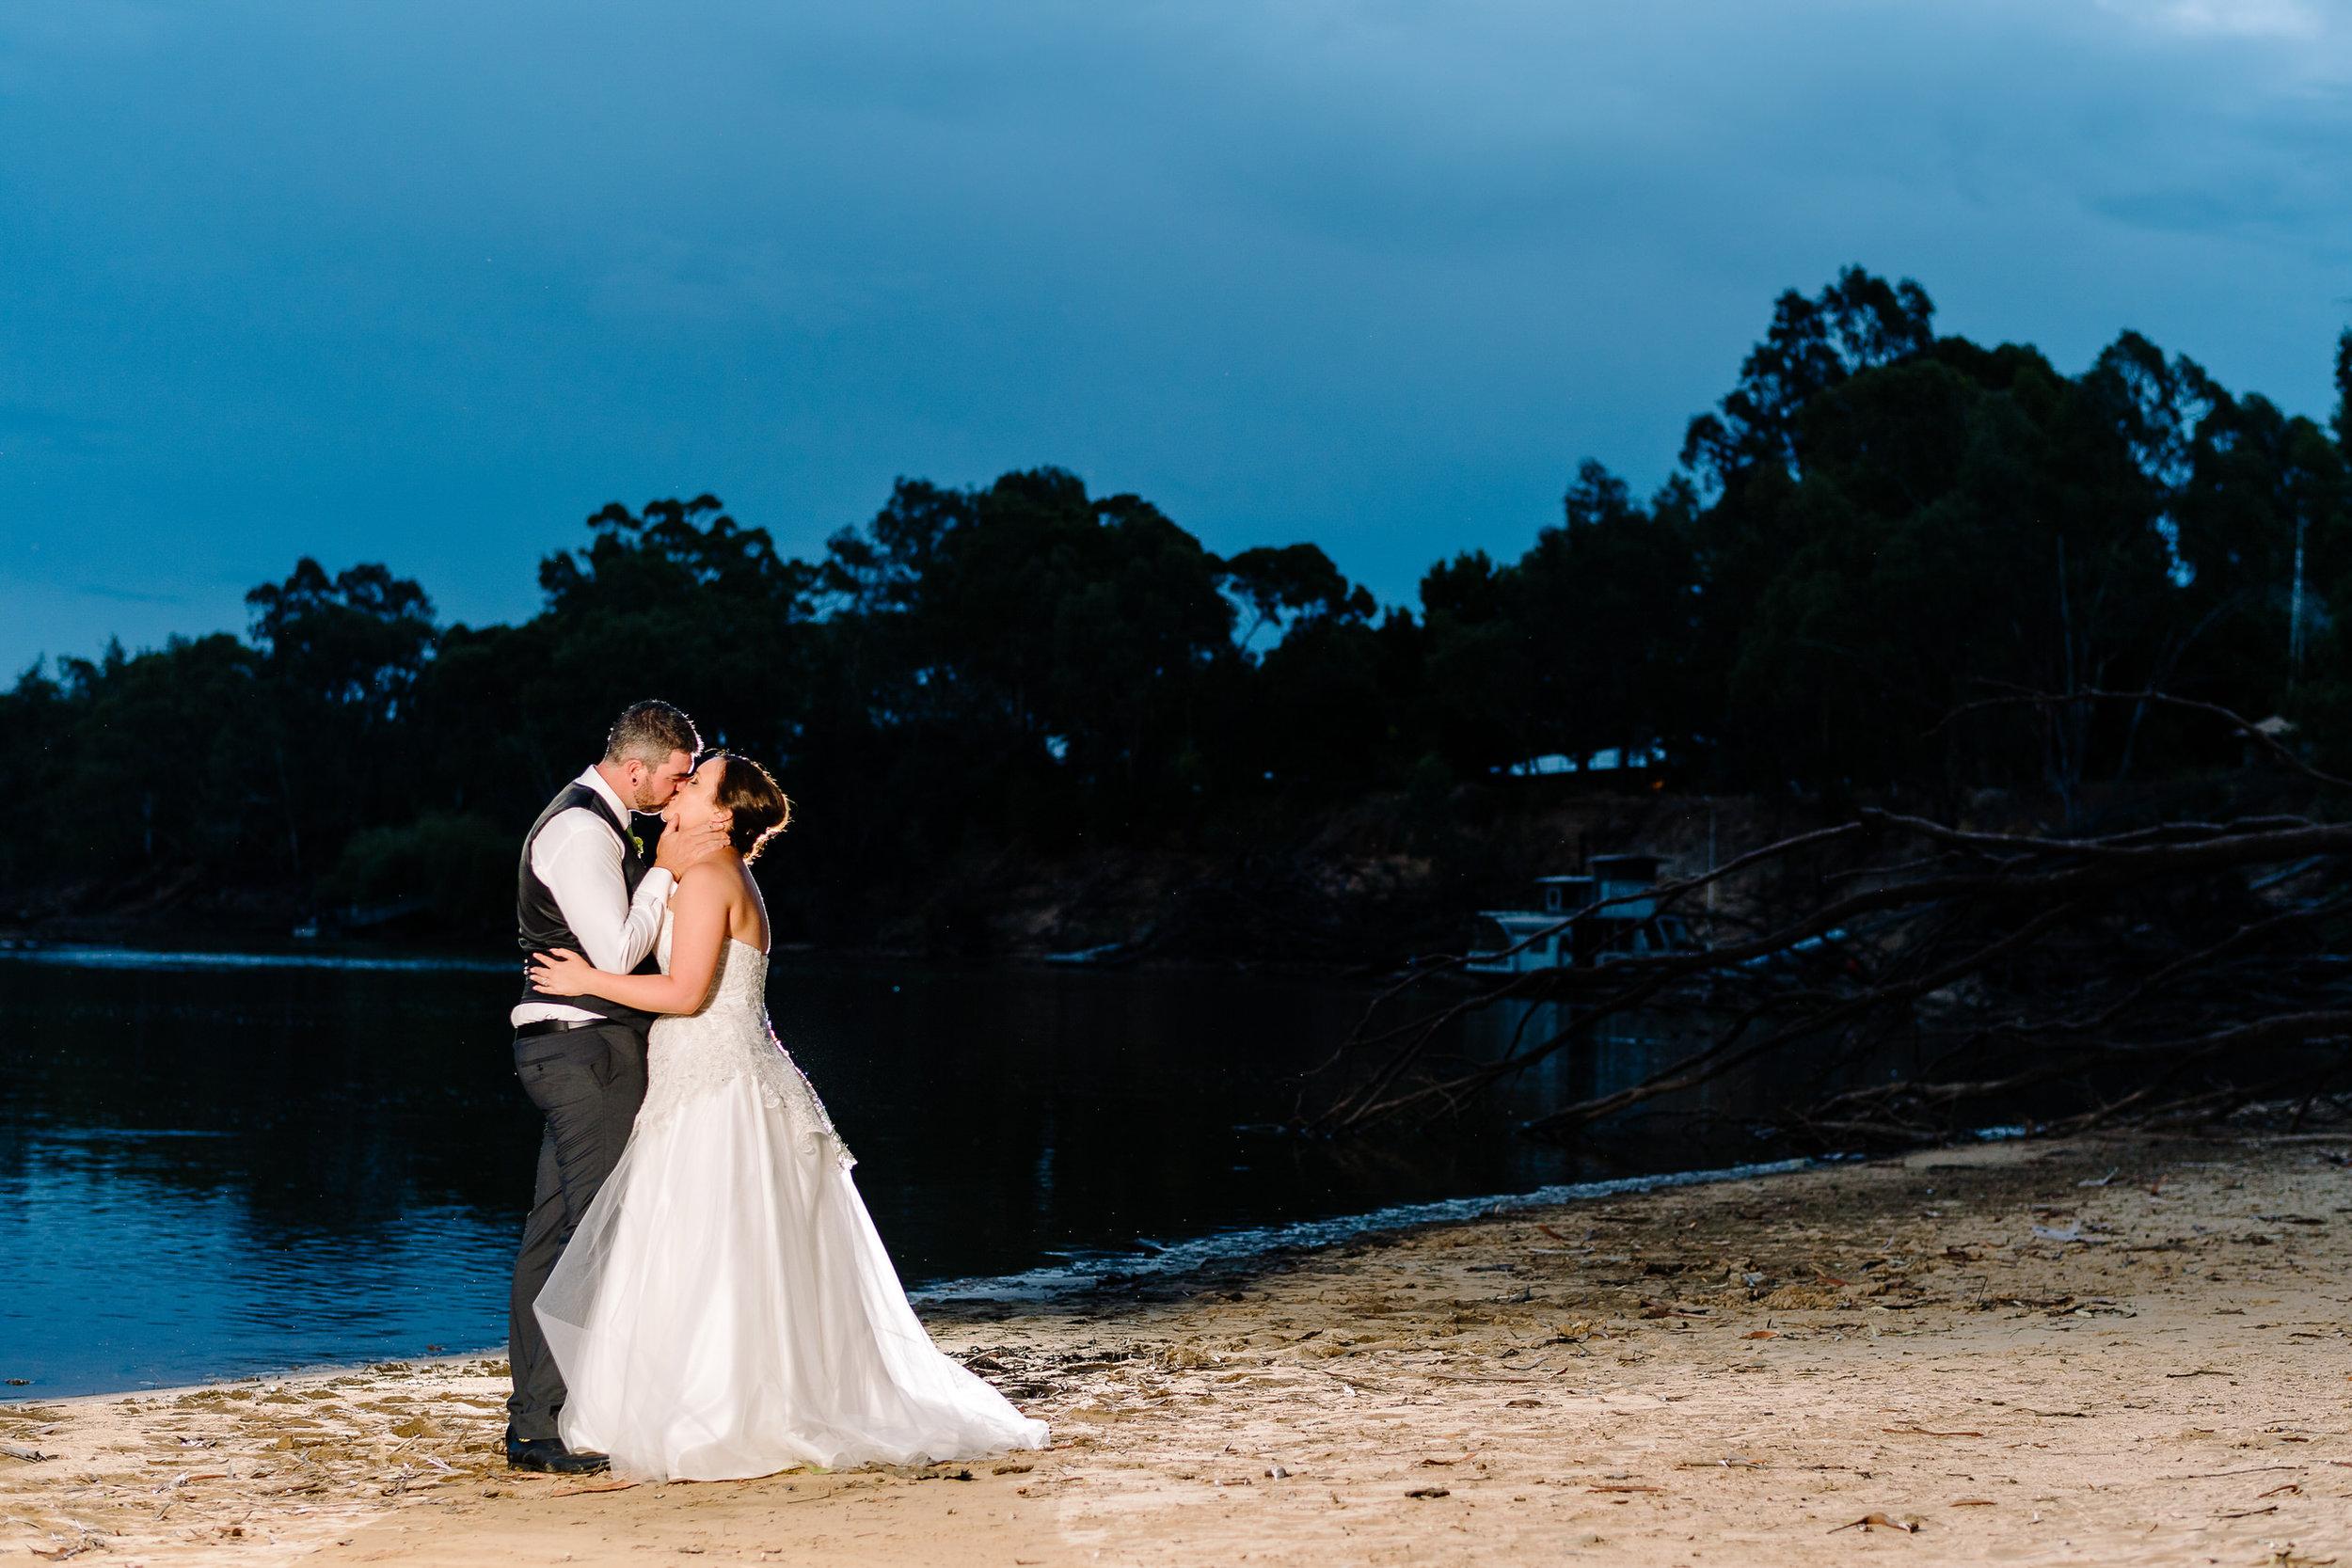 Justin_Jim_Echuca_Wedding_Photography_Tindarra-291.JPG